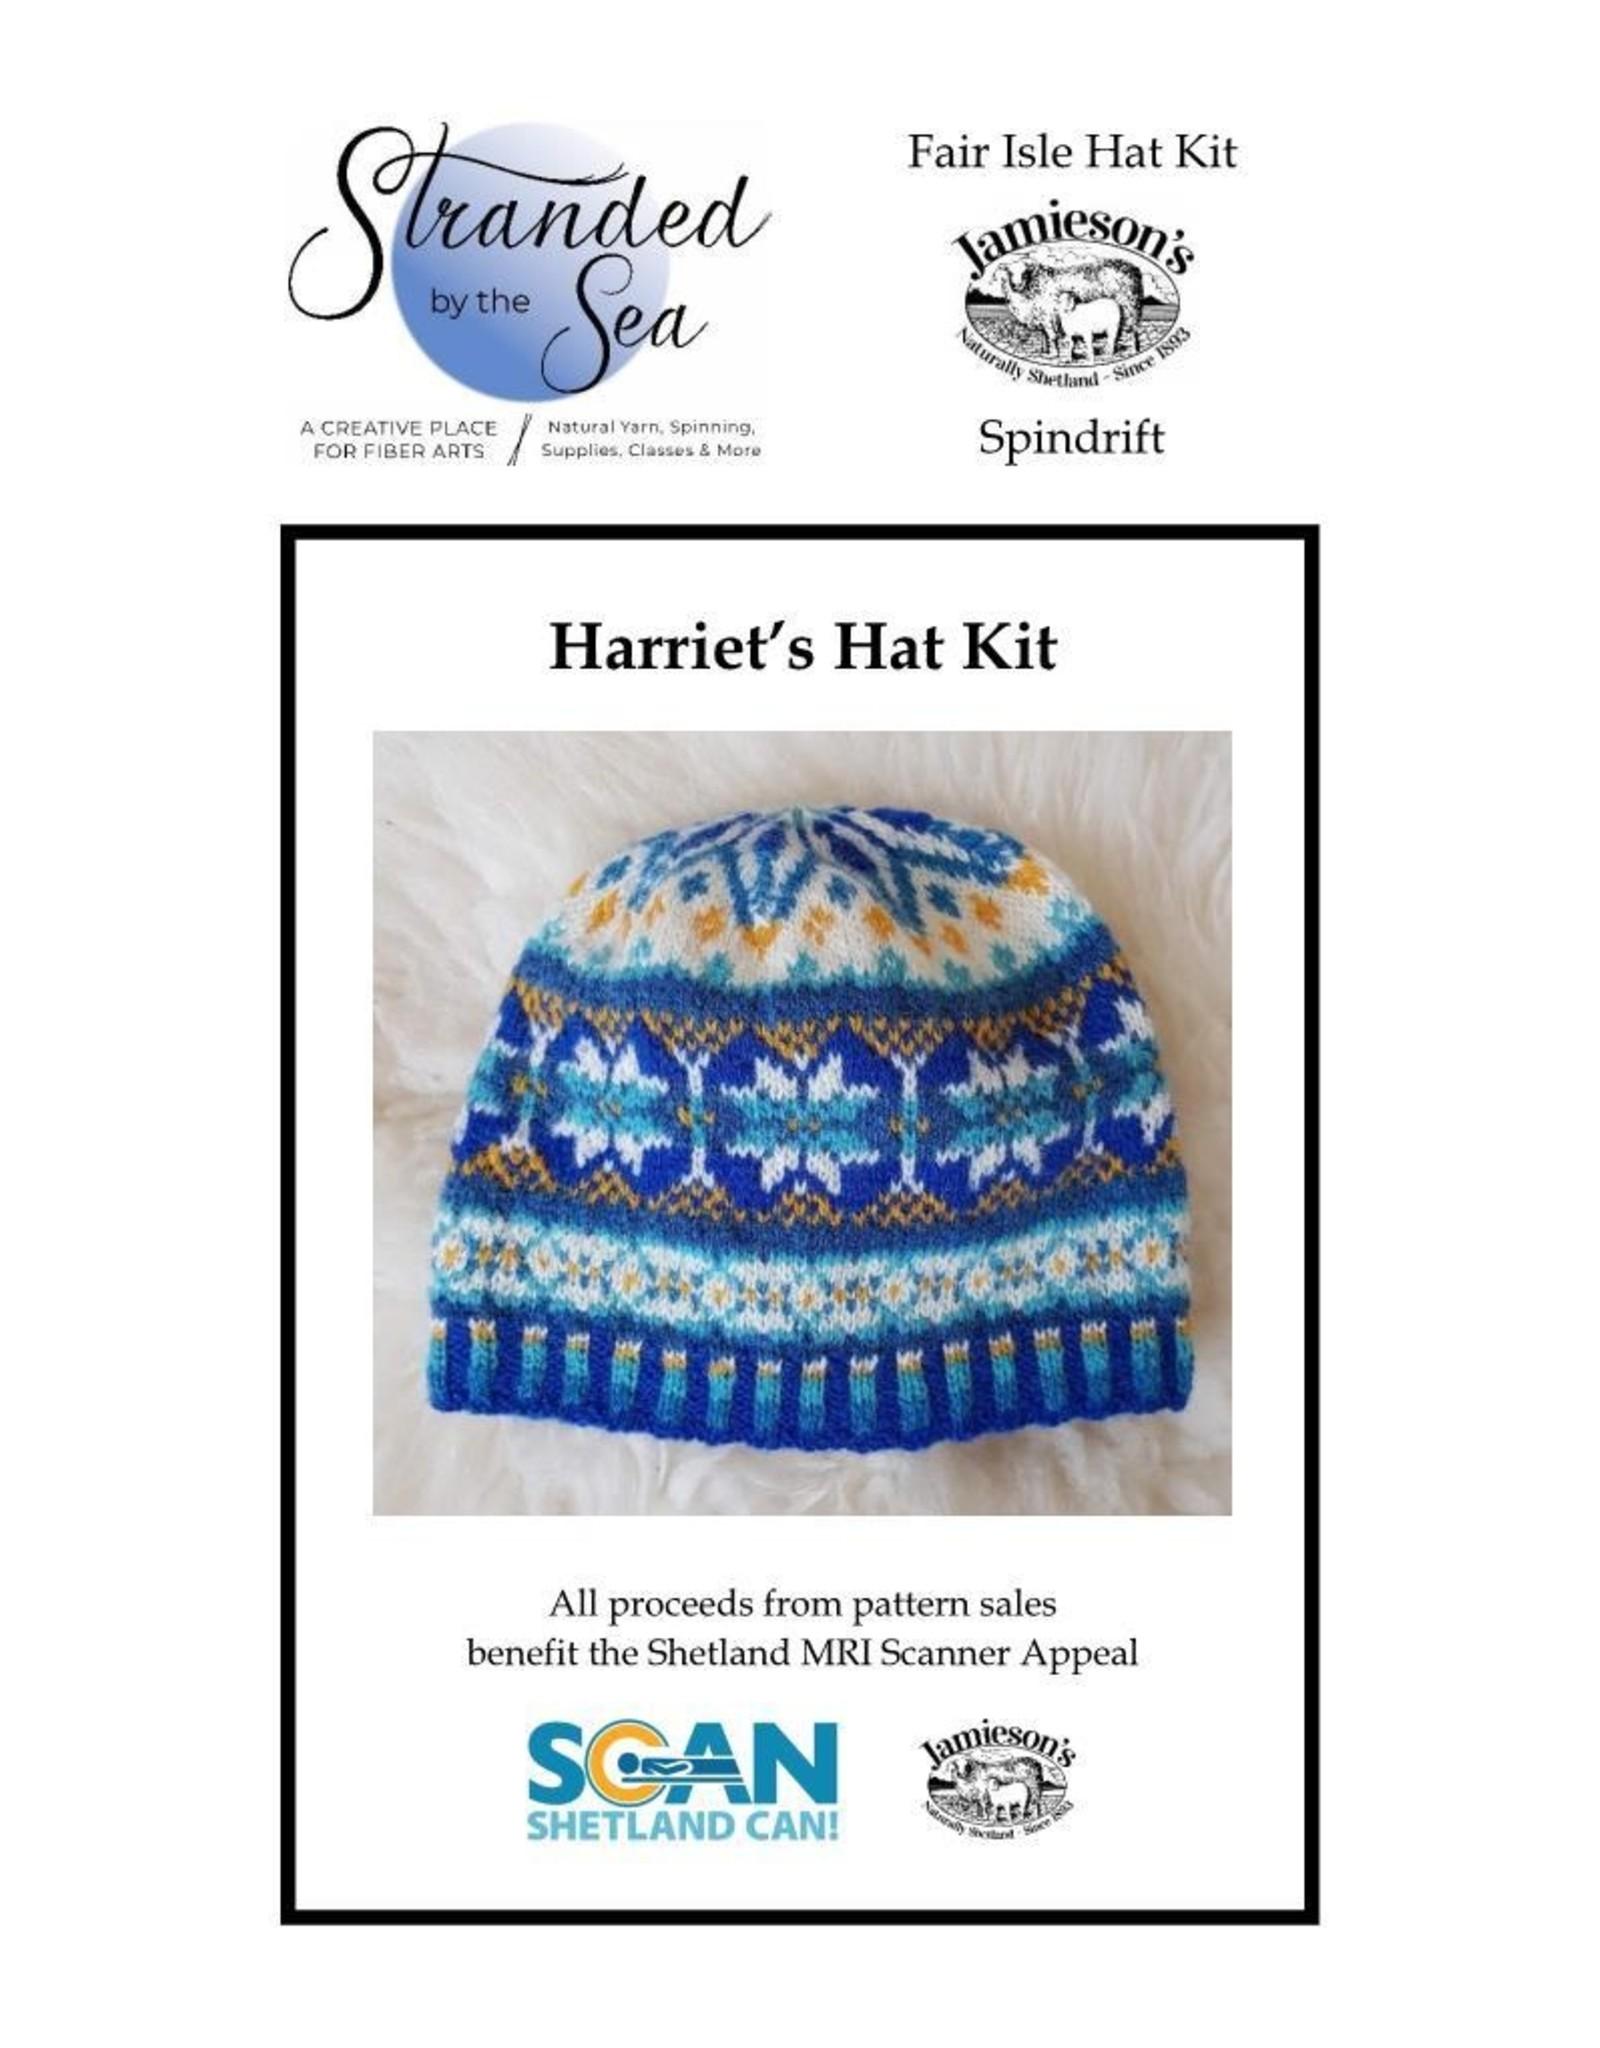 Jamieson's of Shetland Harriet's Hat Kit